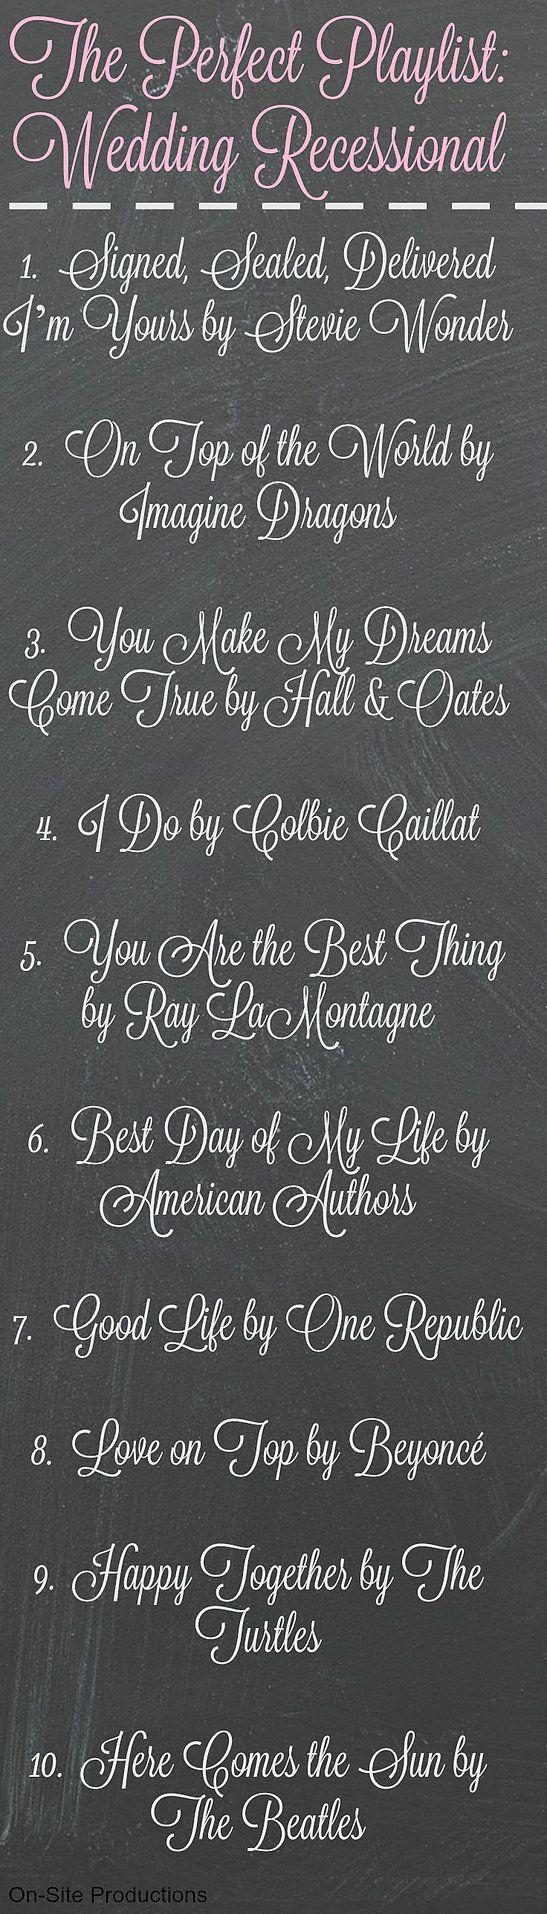 Ten wedding recessional songs future mrs hess pinterest